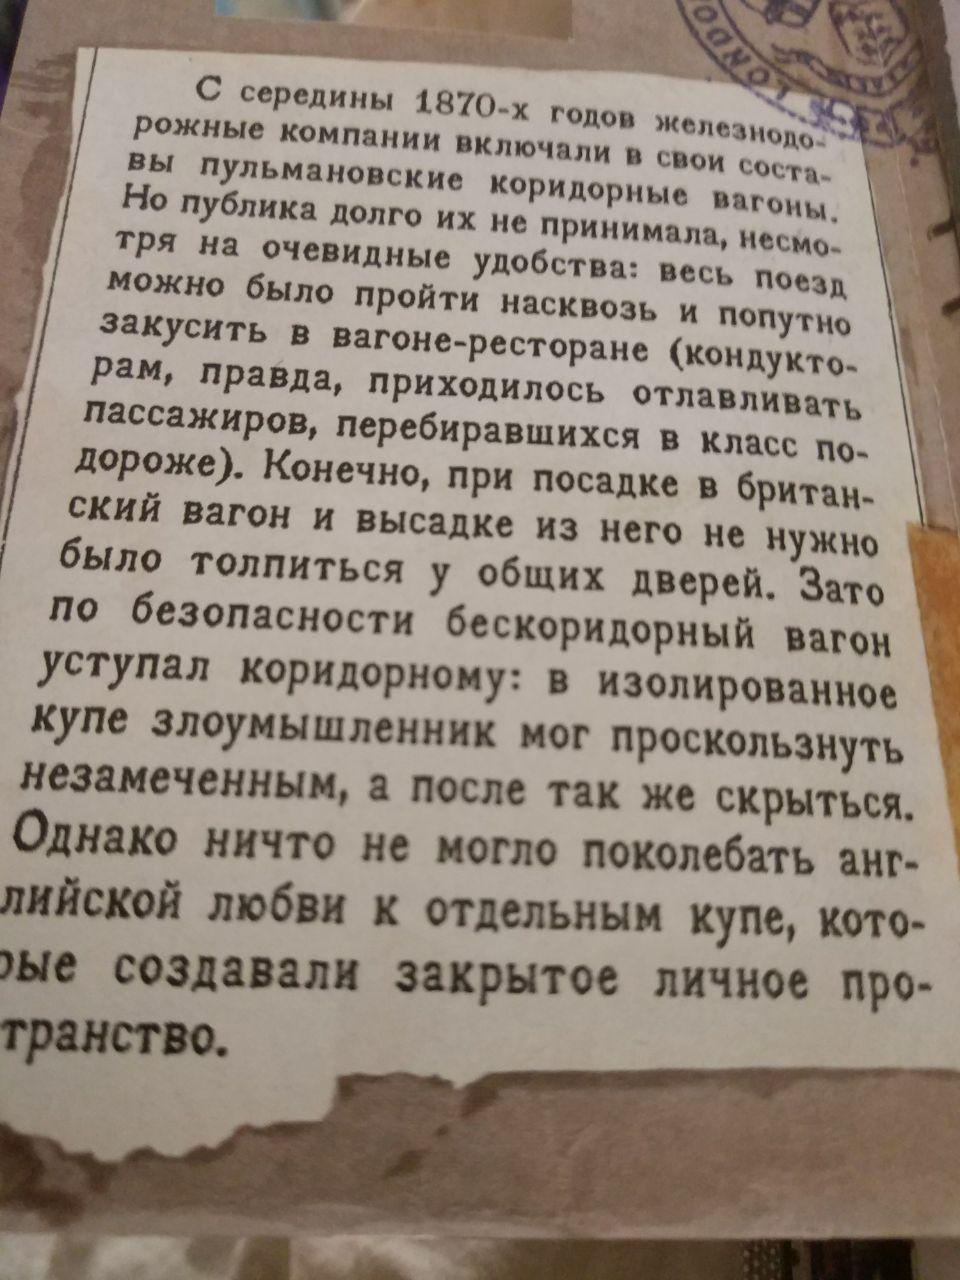 http://s7.uploads.ru/8PuMY.jpg